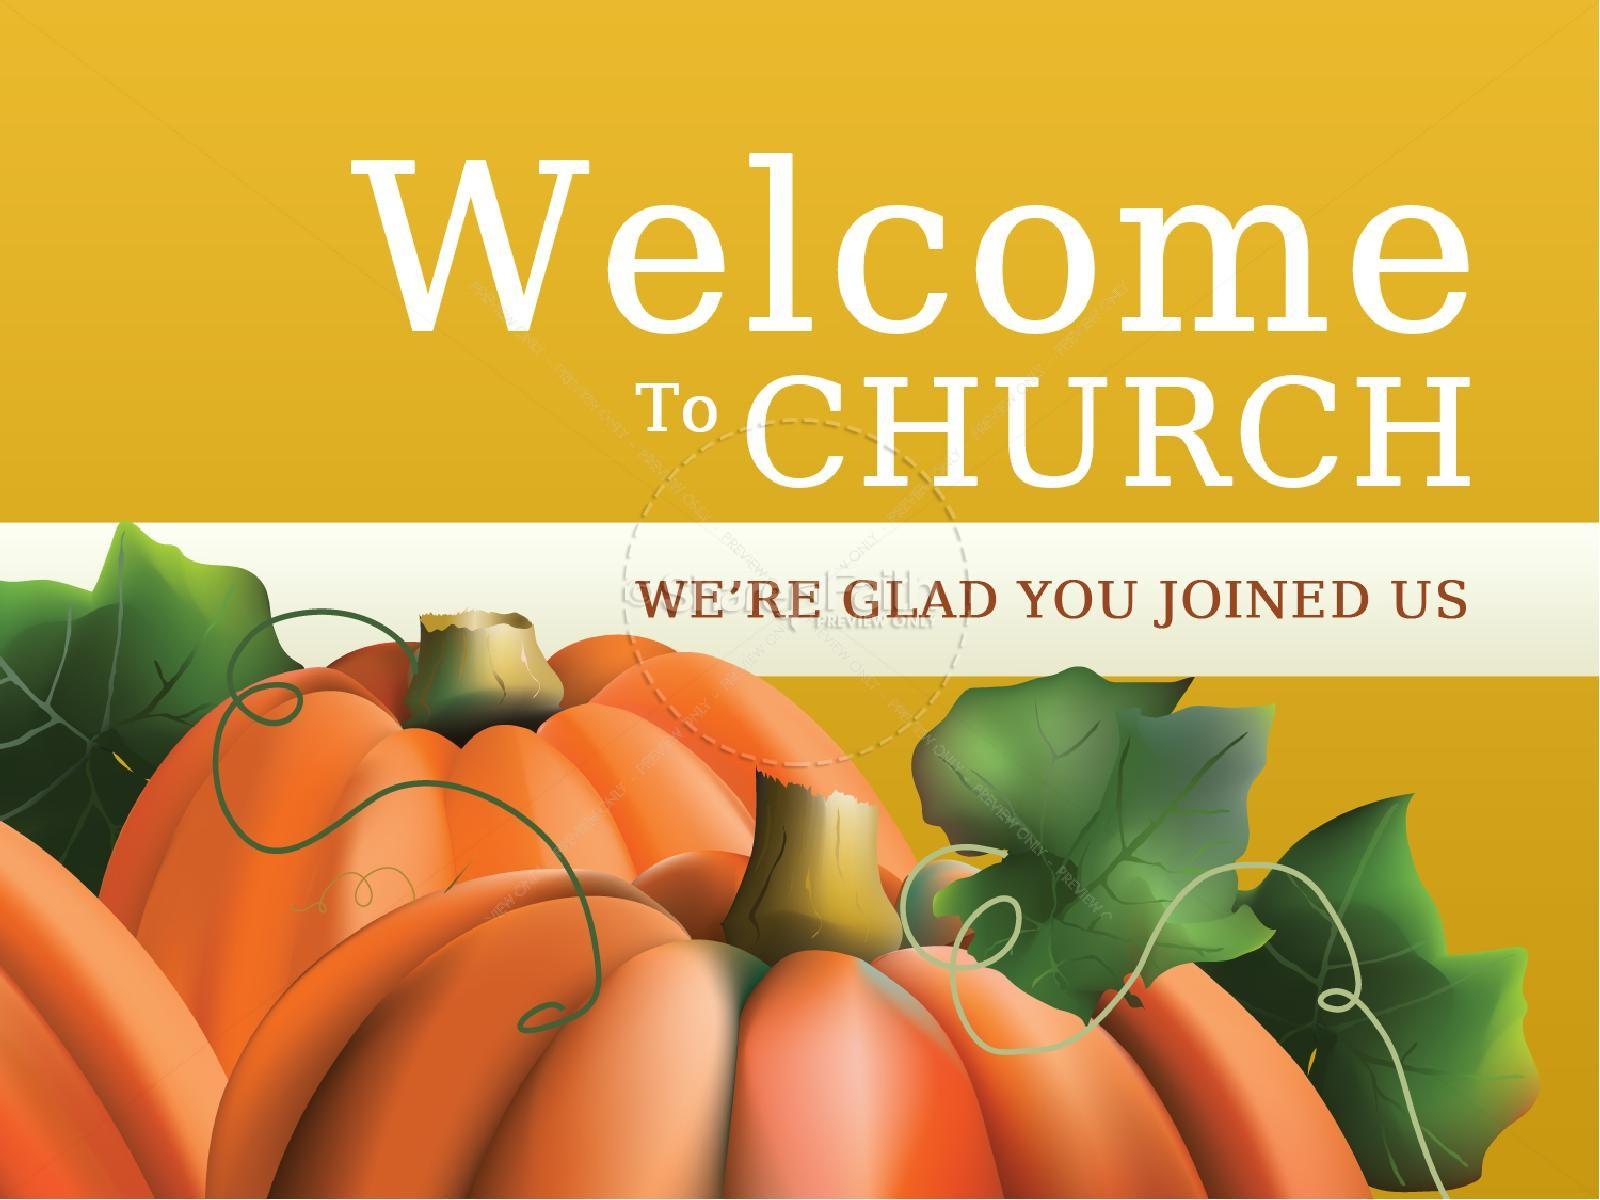 Welcome To Church Sermon Presentation | slide 1